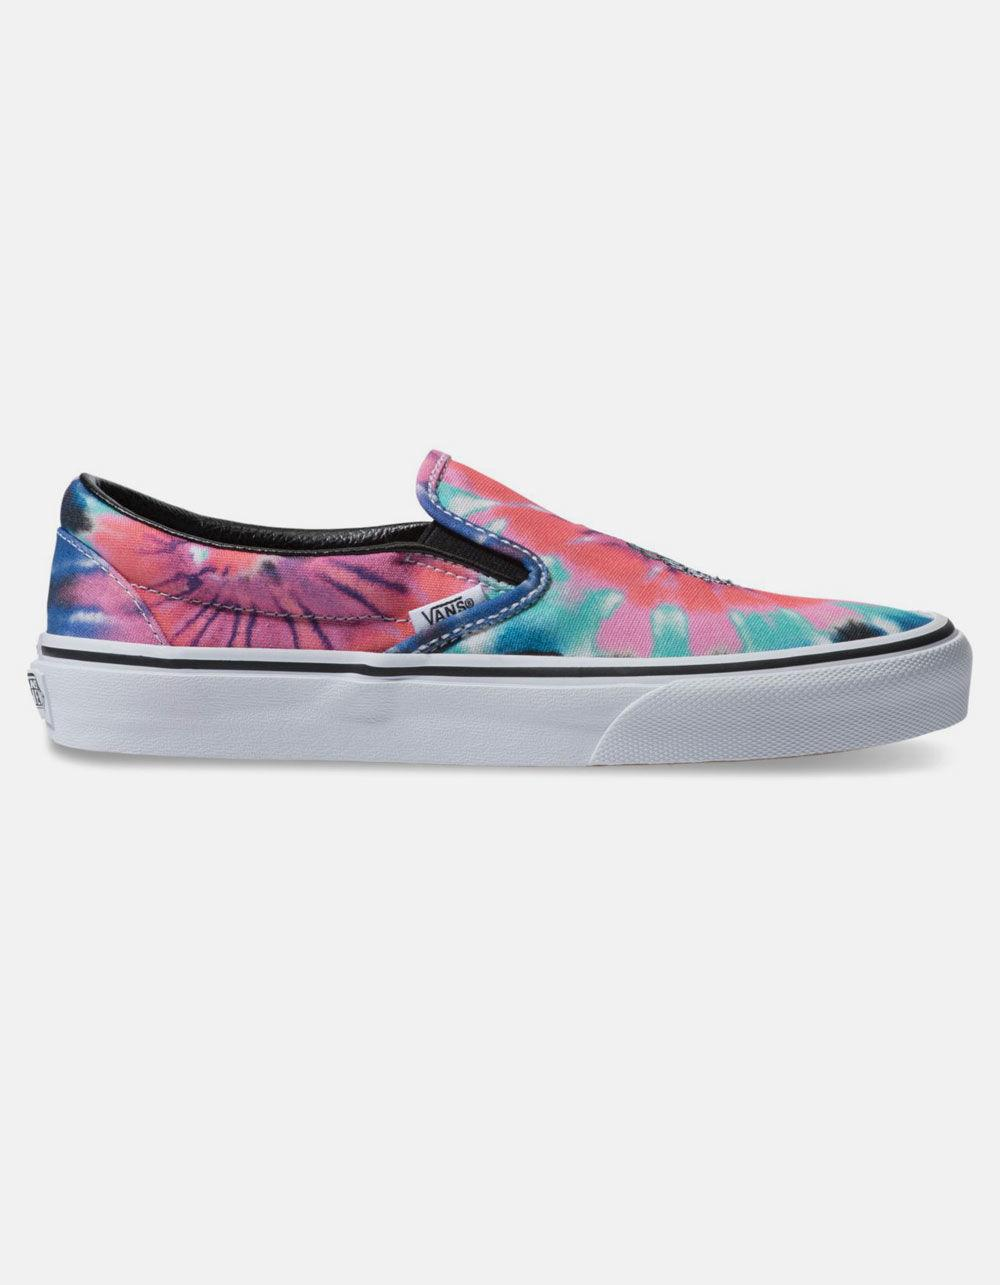 667c5da6859 Lyst - Vans Tie Dye Classic Slip-on Womens Shoes